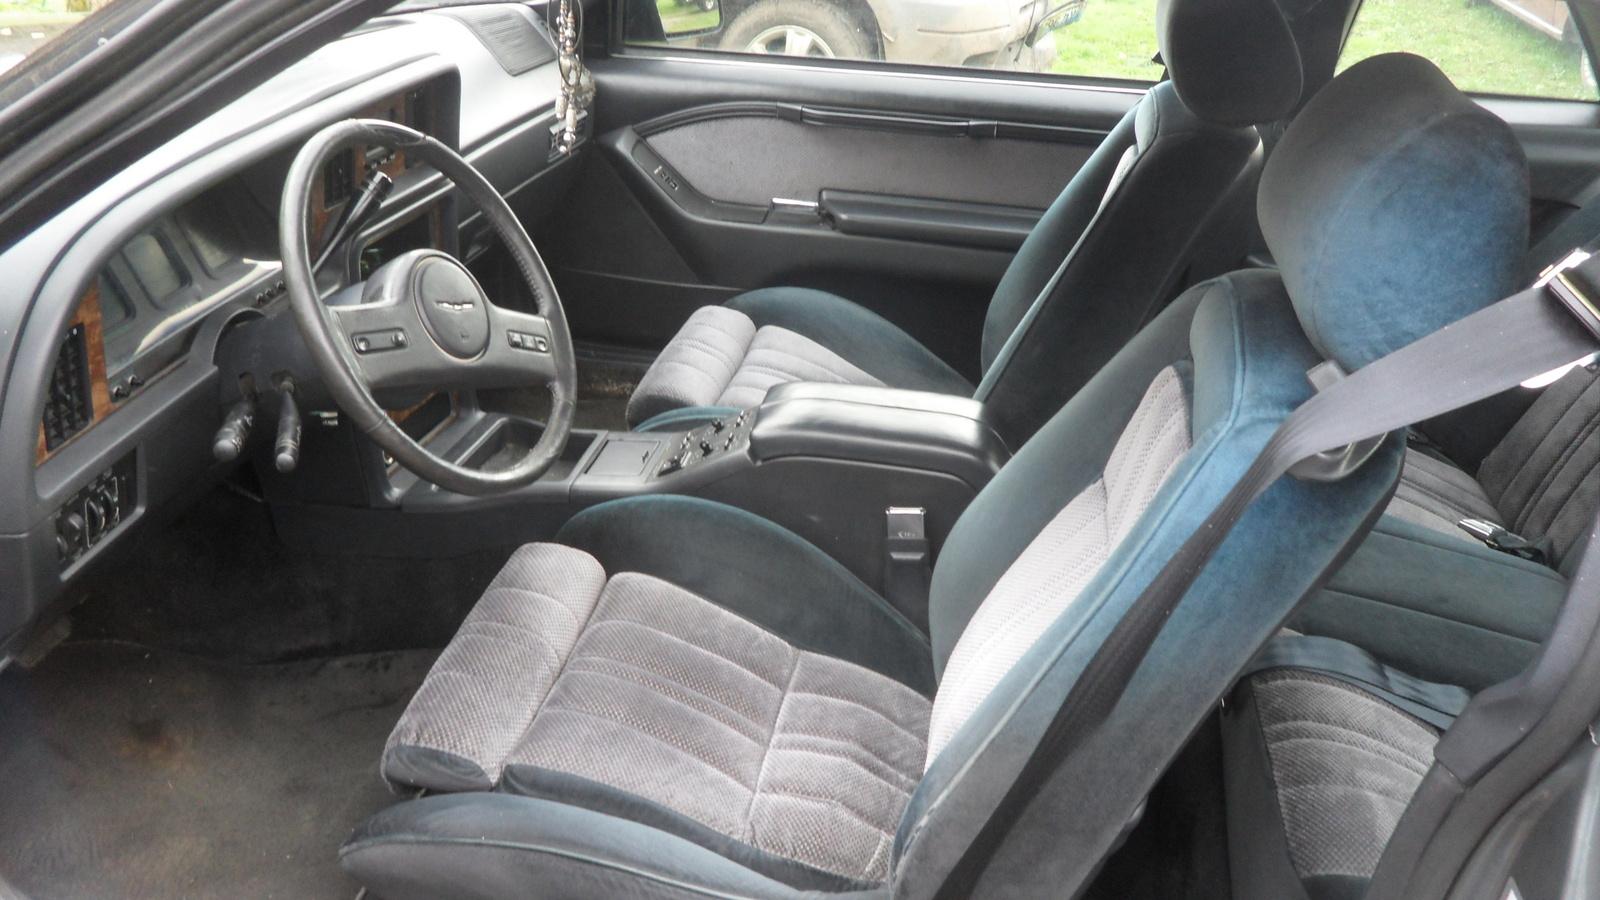 1987 Ford Thunderbird Interior 1987 Ford Thunderbird Turbo